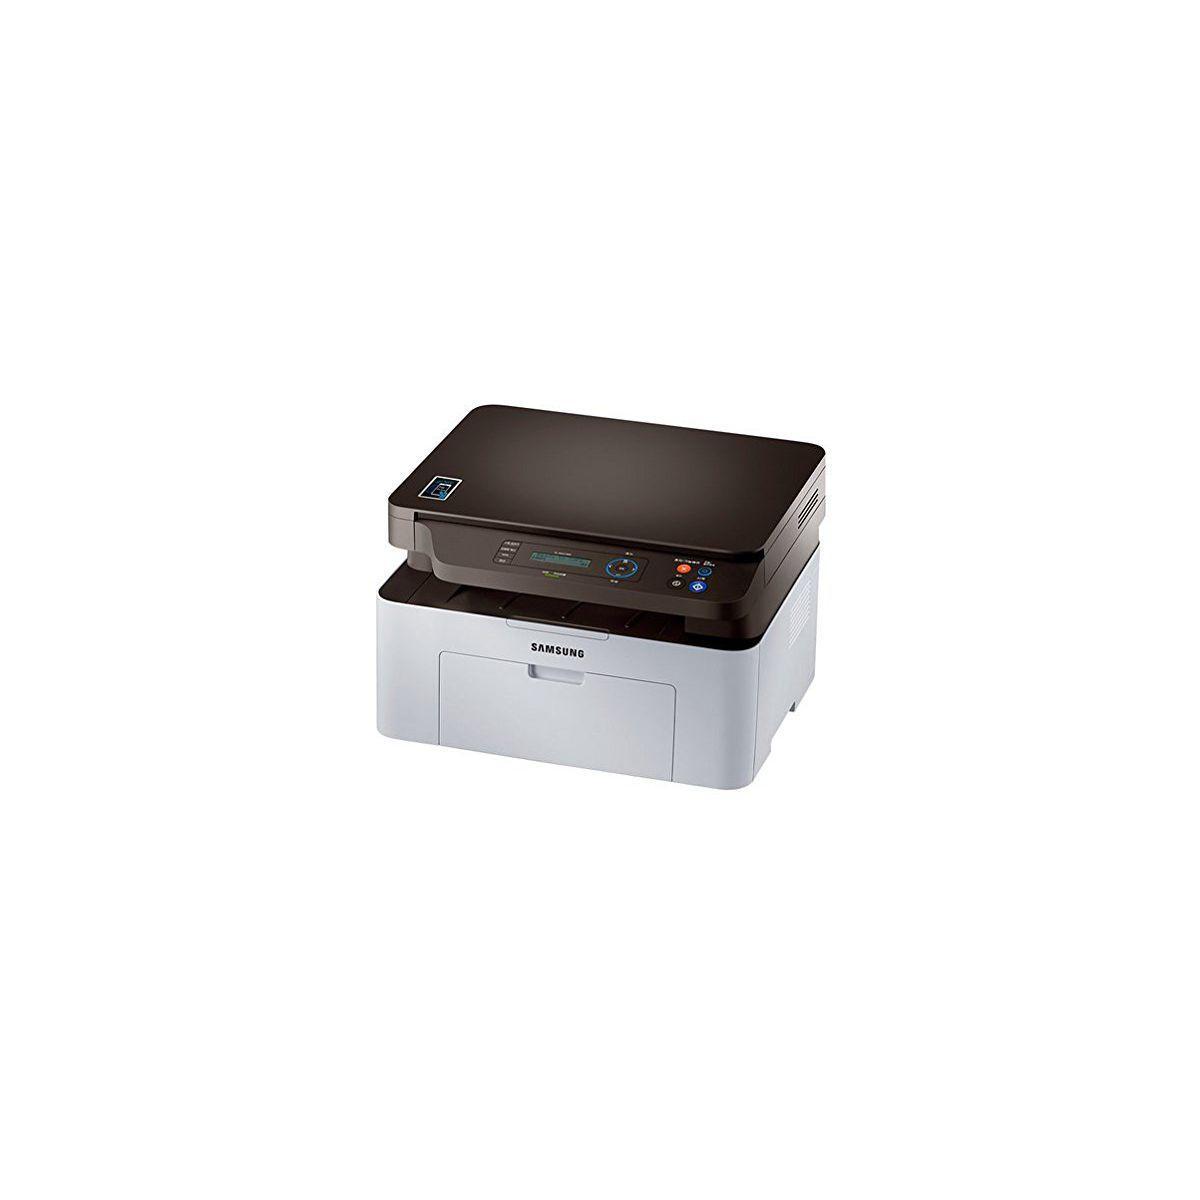 Imprimante multifonction laser samsung sl-m2078w